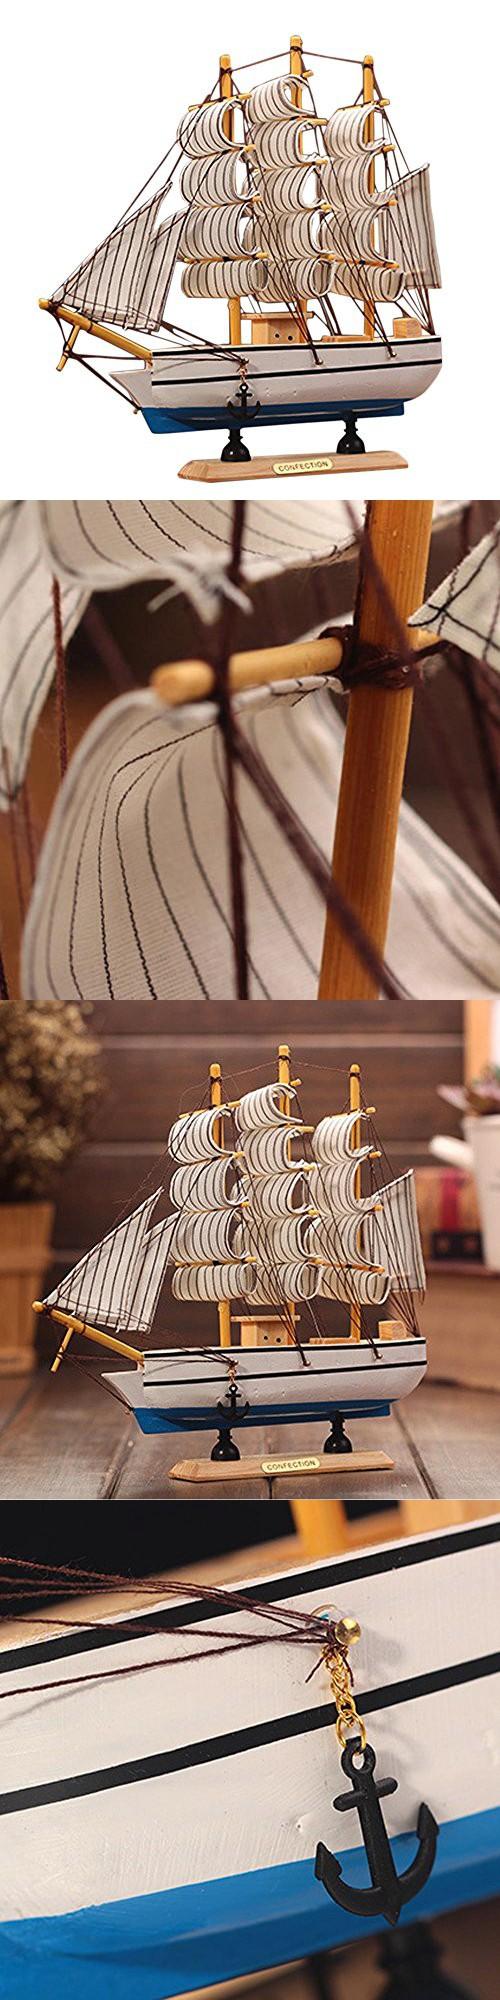 Kangkang@ Wooden Ship Model Miniatur Marine Wood Maritime Boat Nautical  Sailing Ship Home Desk Decoration